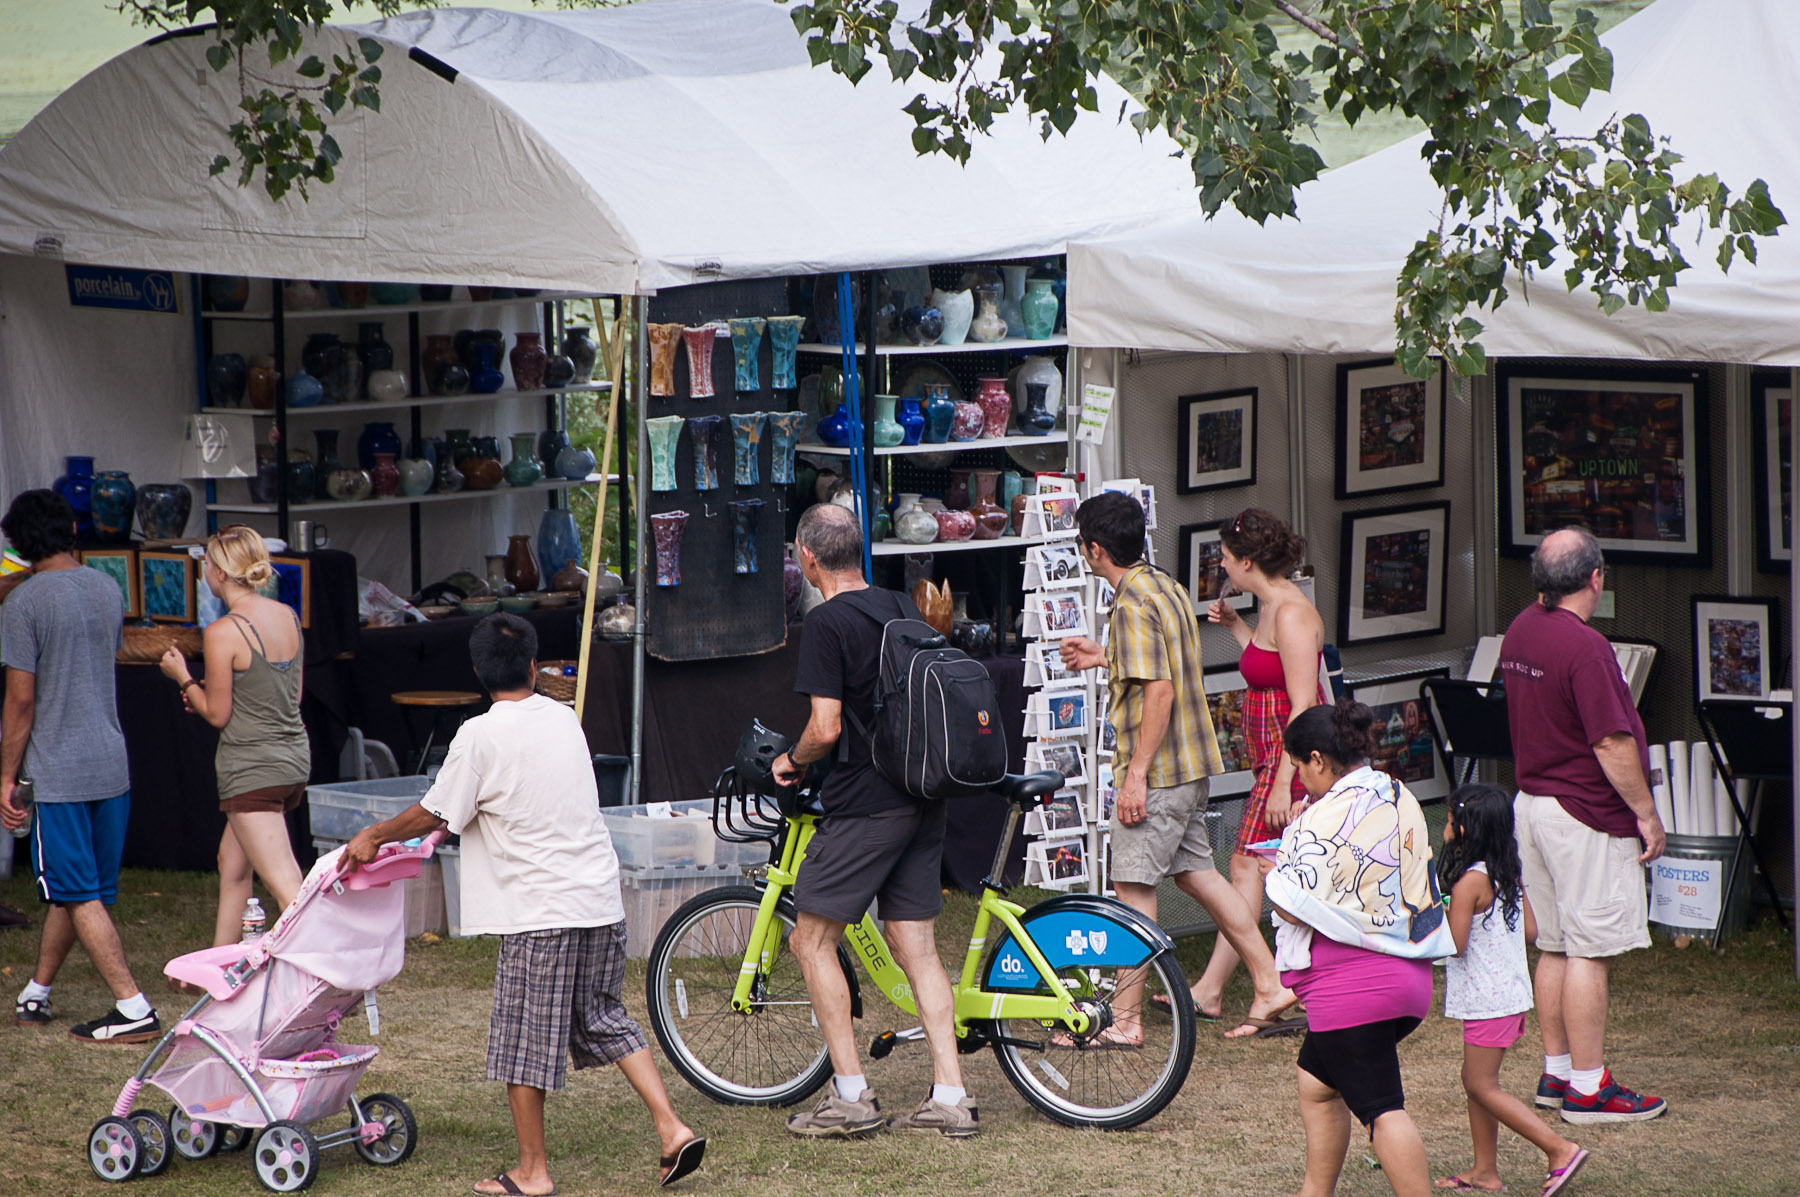 Attendees at the Powderhorn Art Fair